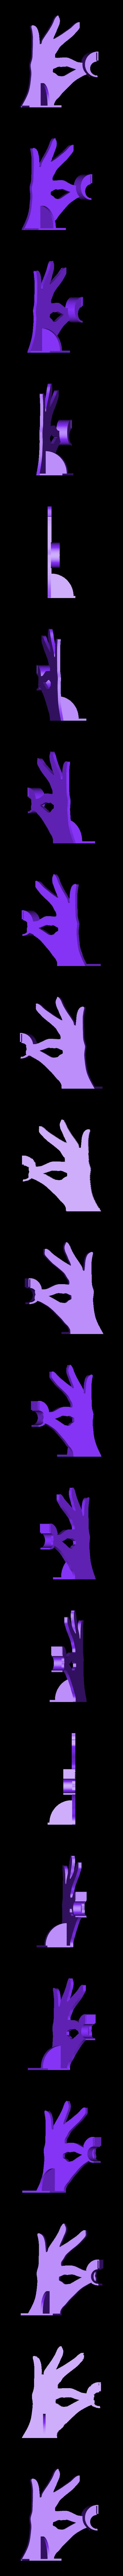 Hand_DX_EUMAKERS.stl Download free STL file Biblio - Bookends • 3D printable model, EUMAKERS